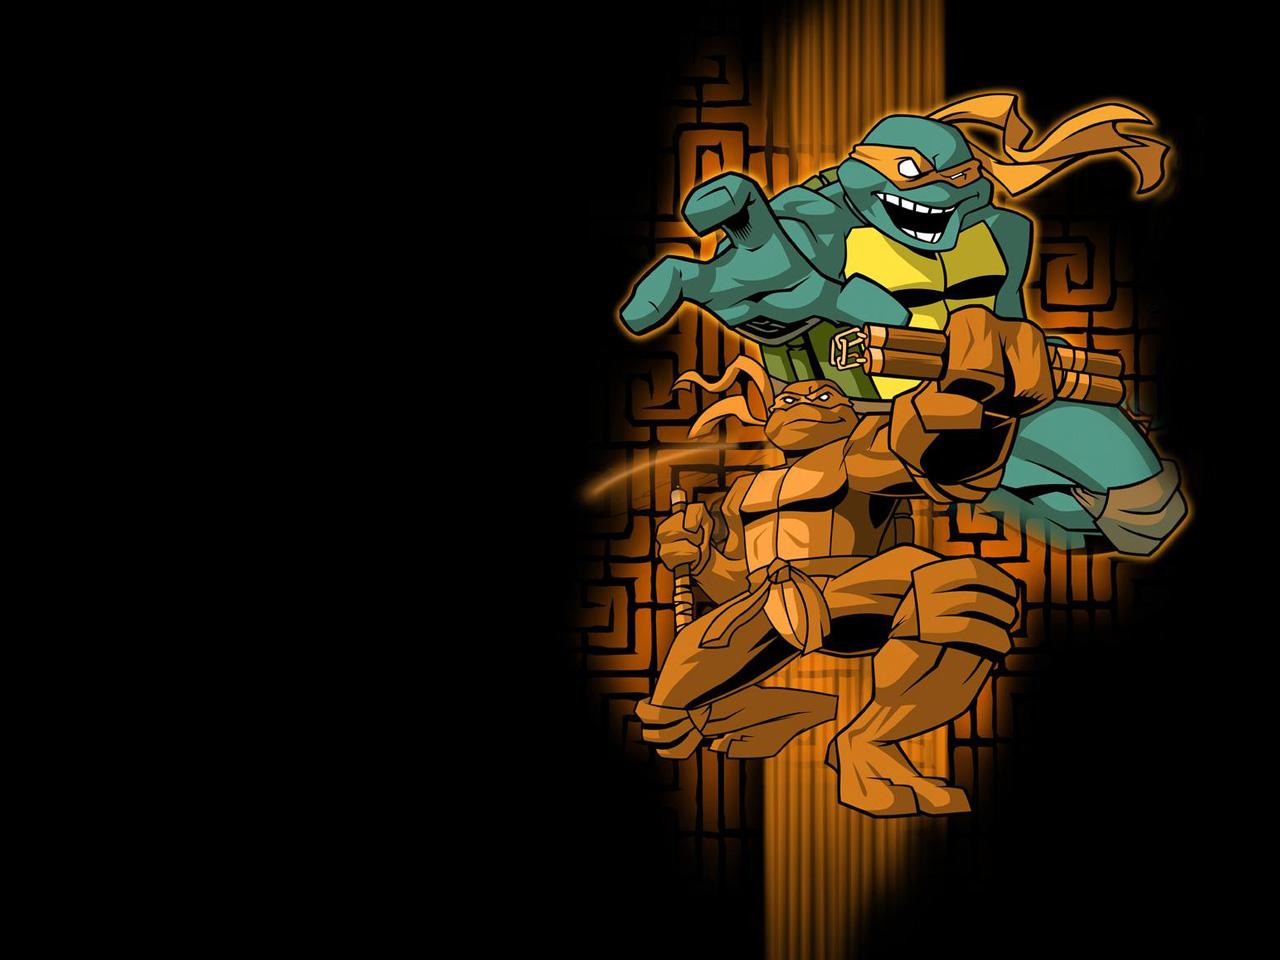 TMNT wallpaper 2003-2009 series (25)